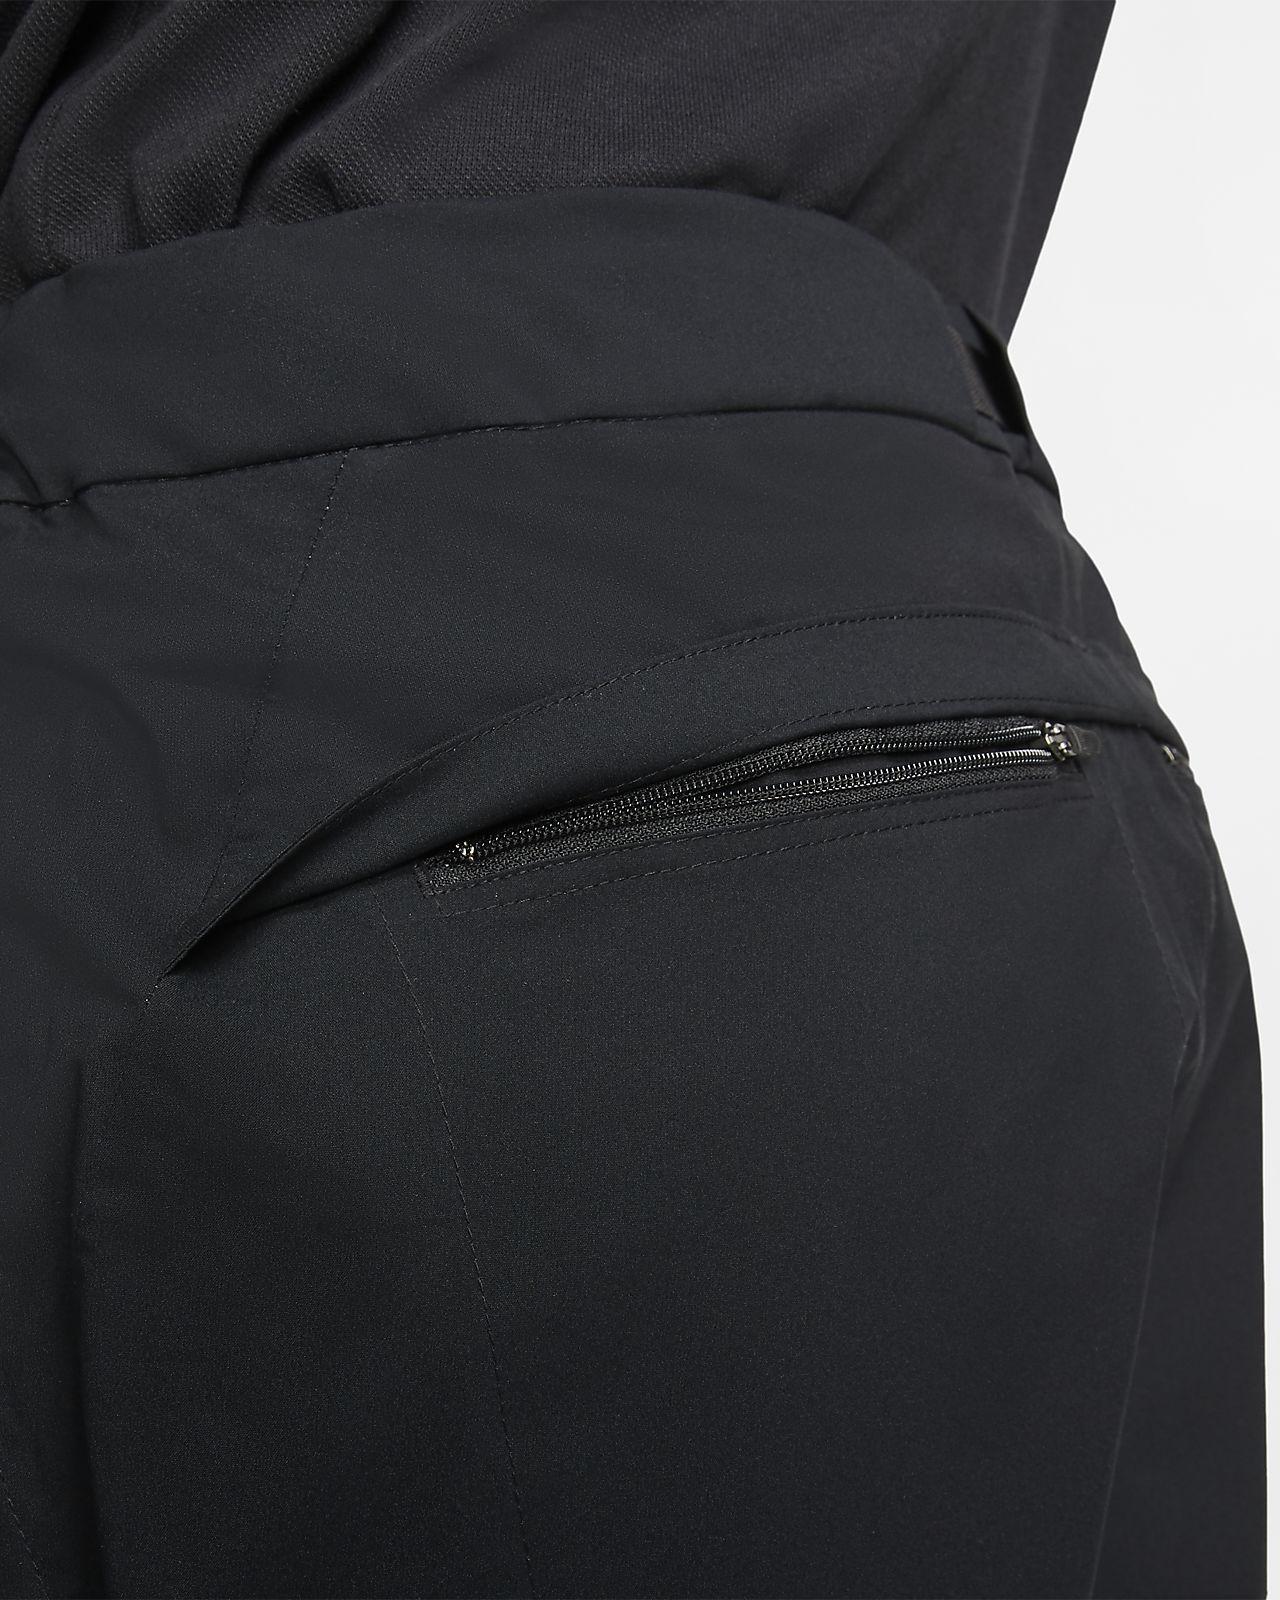 Pantaloni da golf Nike HyperShield Uomo